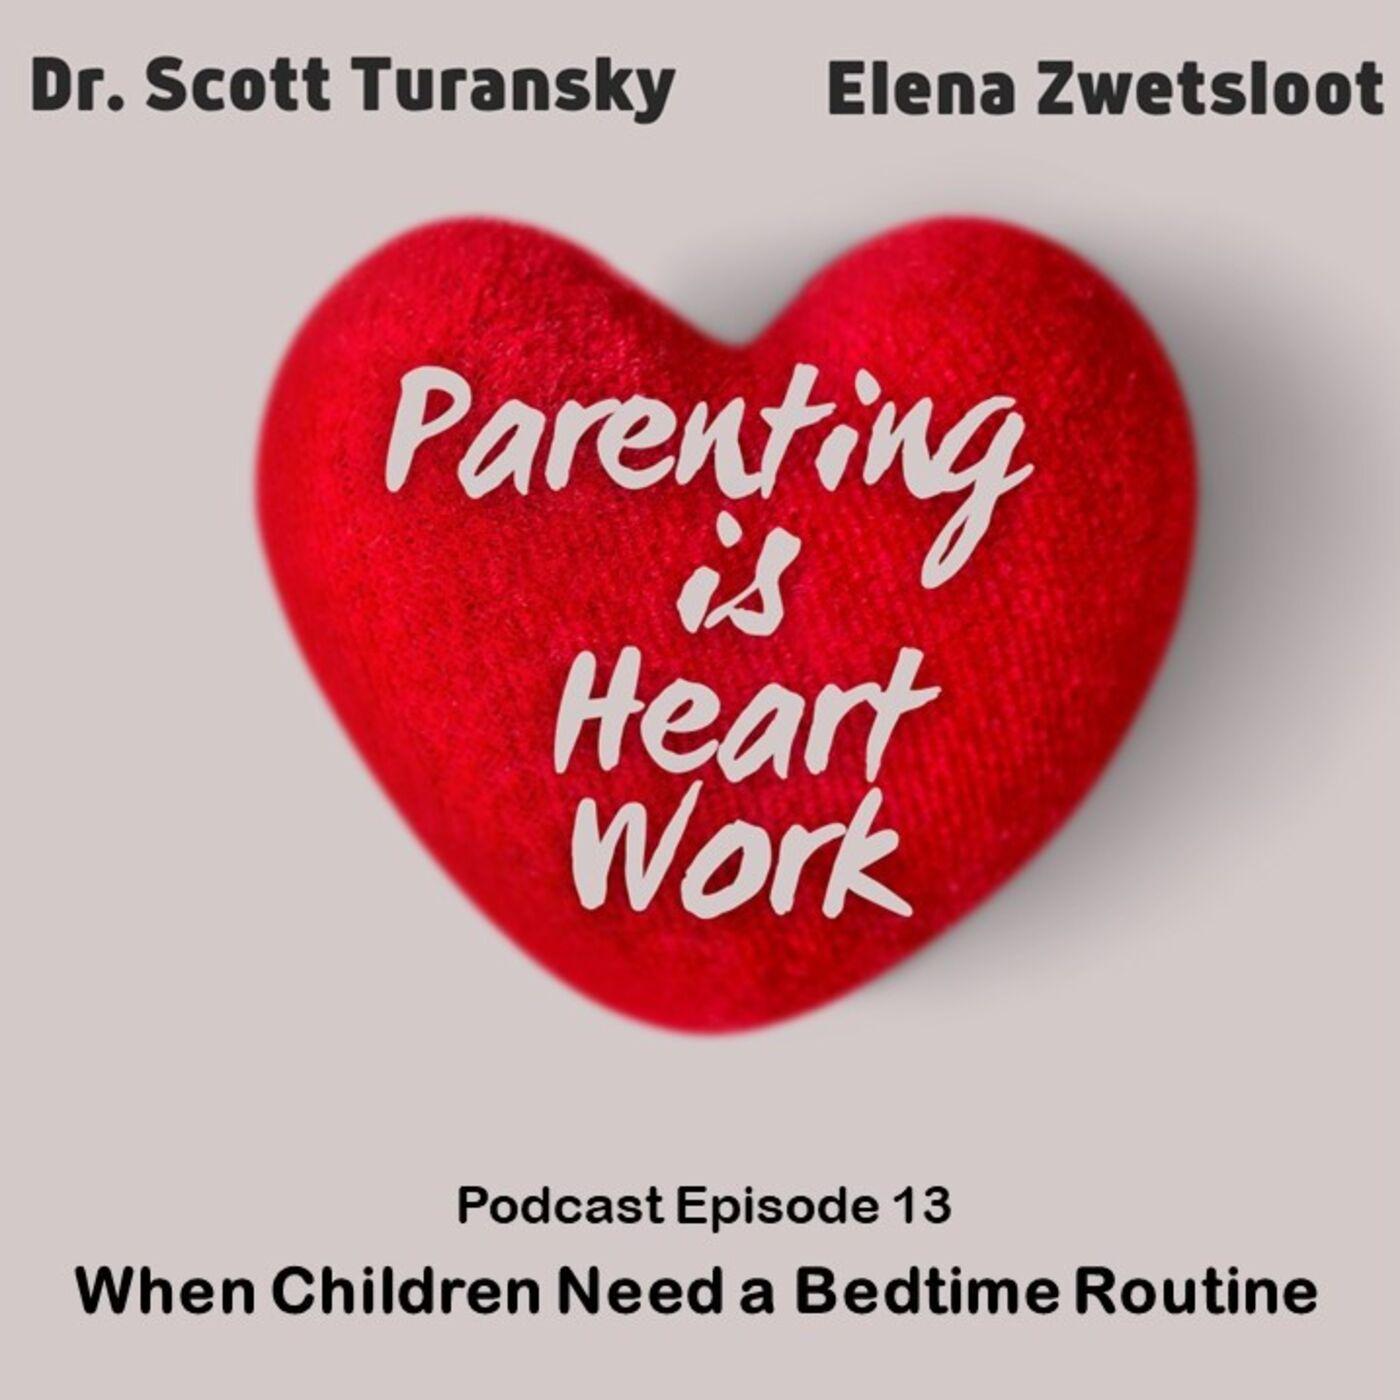 12. When Children Need a Bedtime Routine